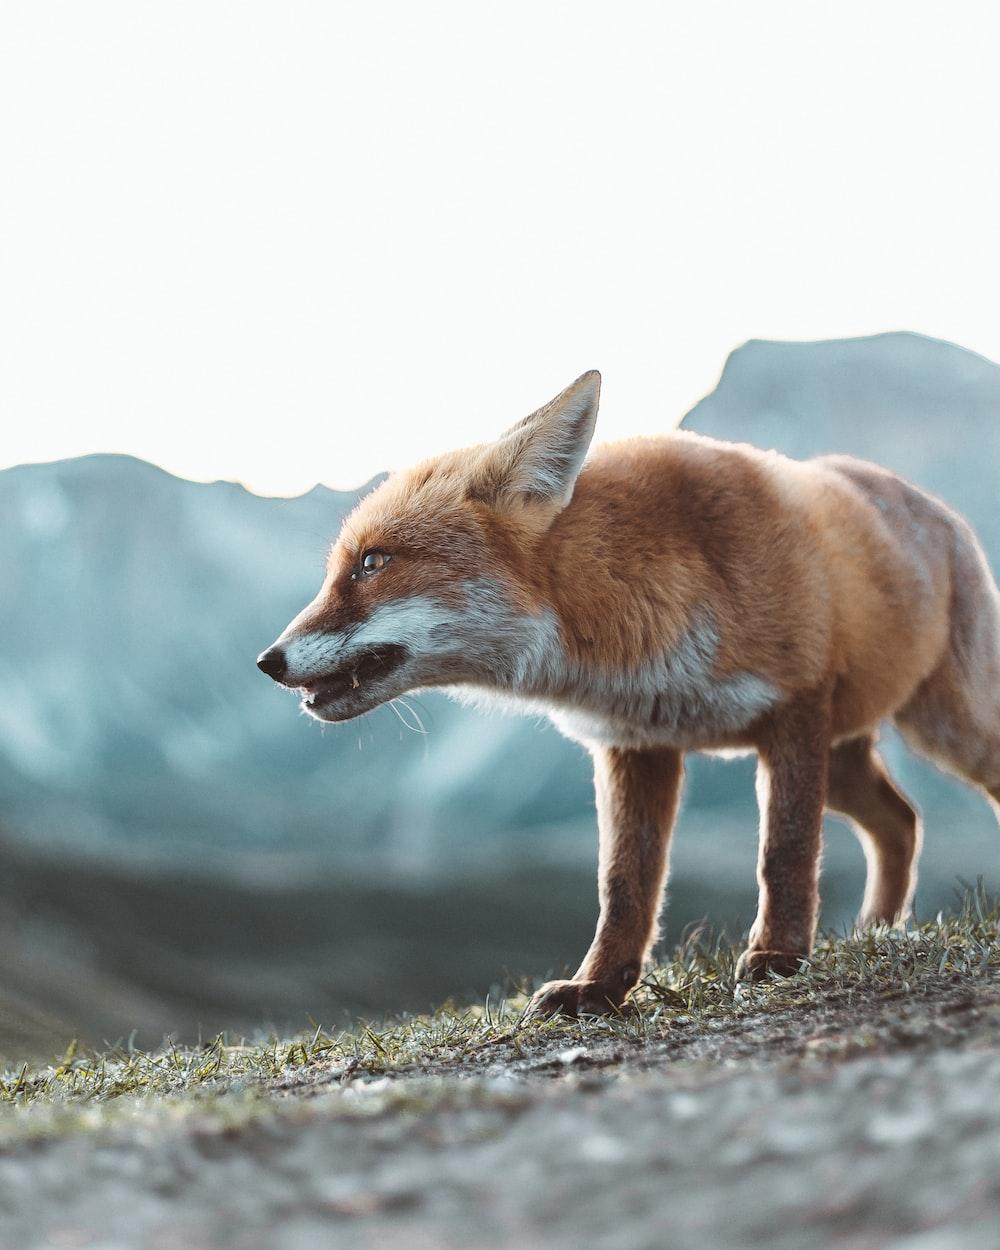 brown fox on gray ground during daytime